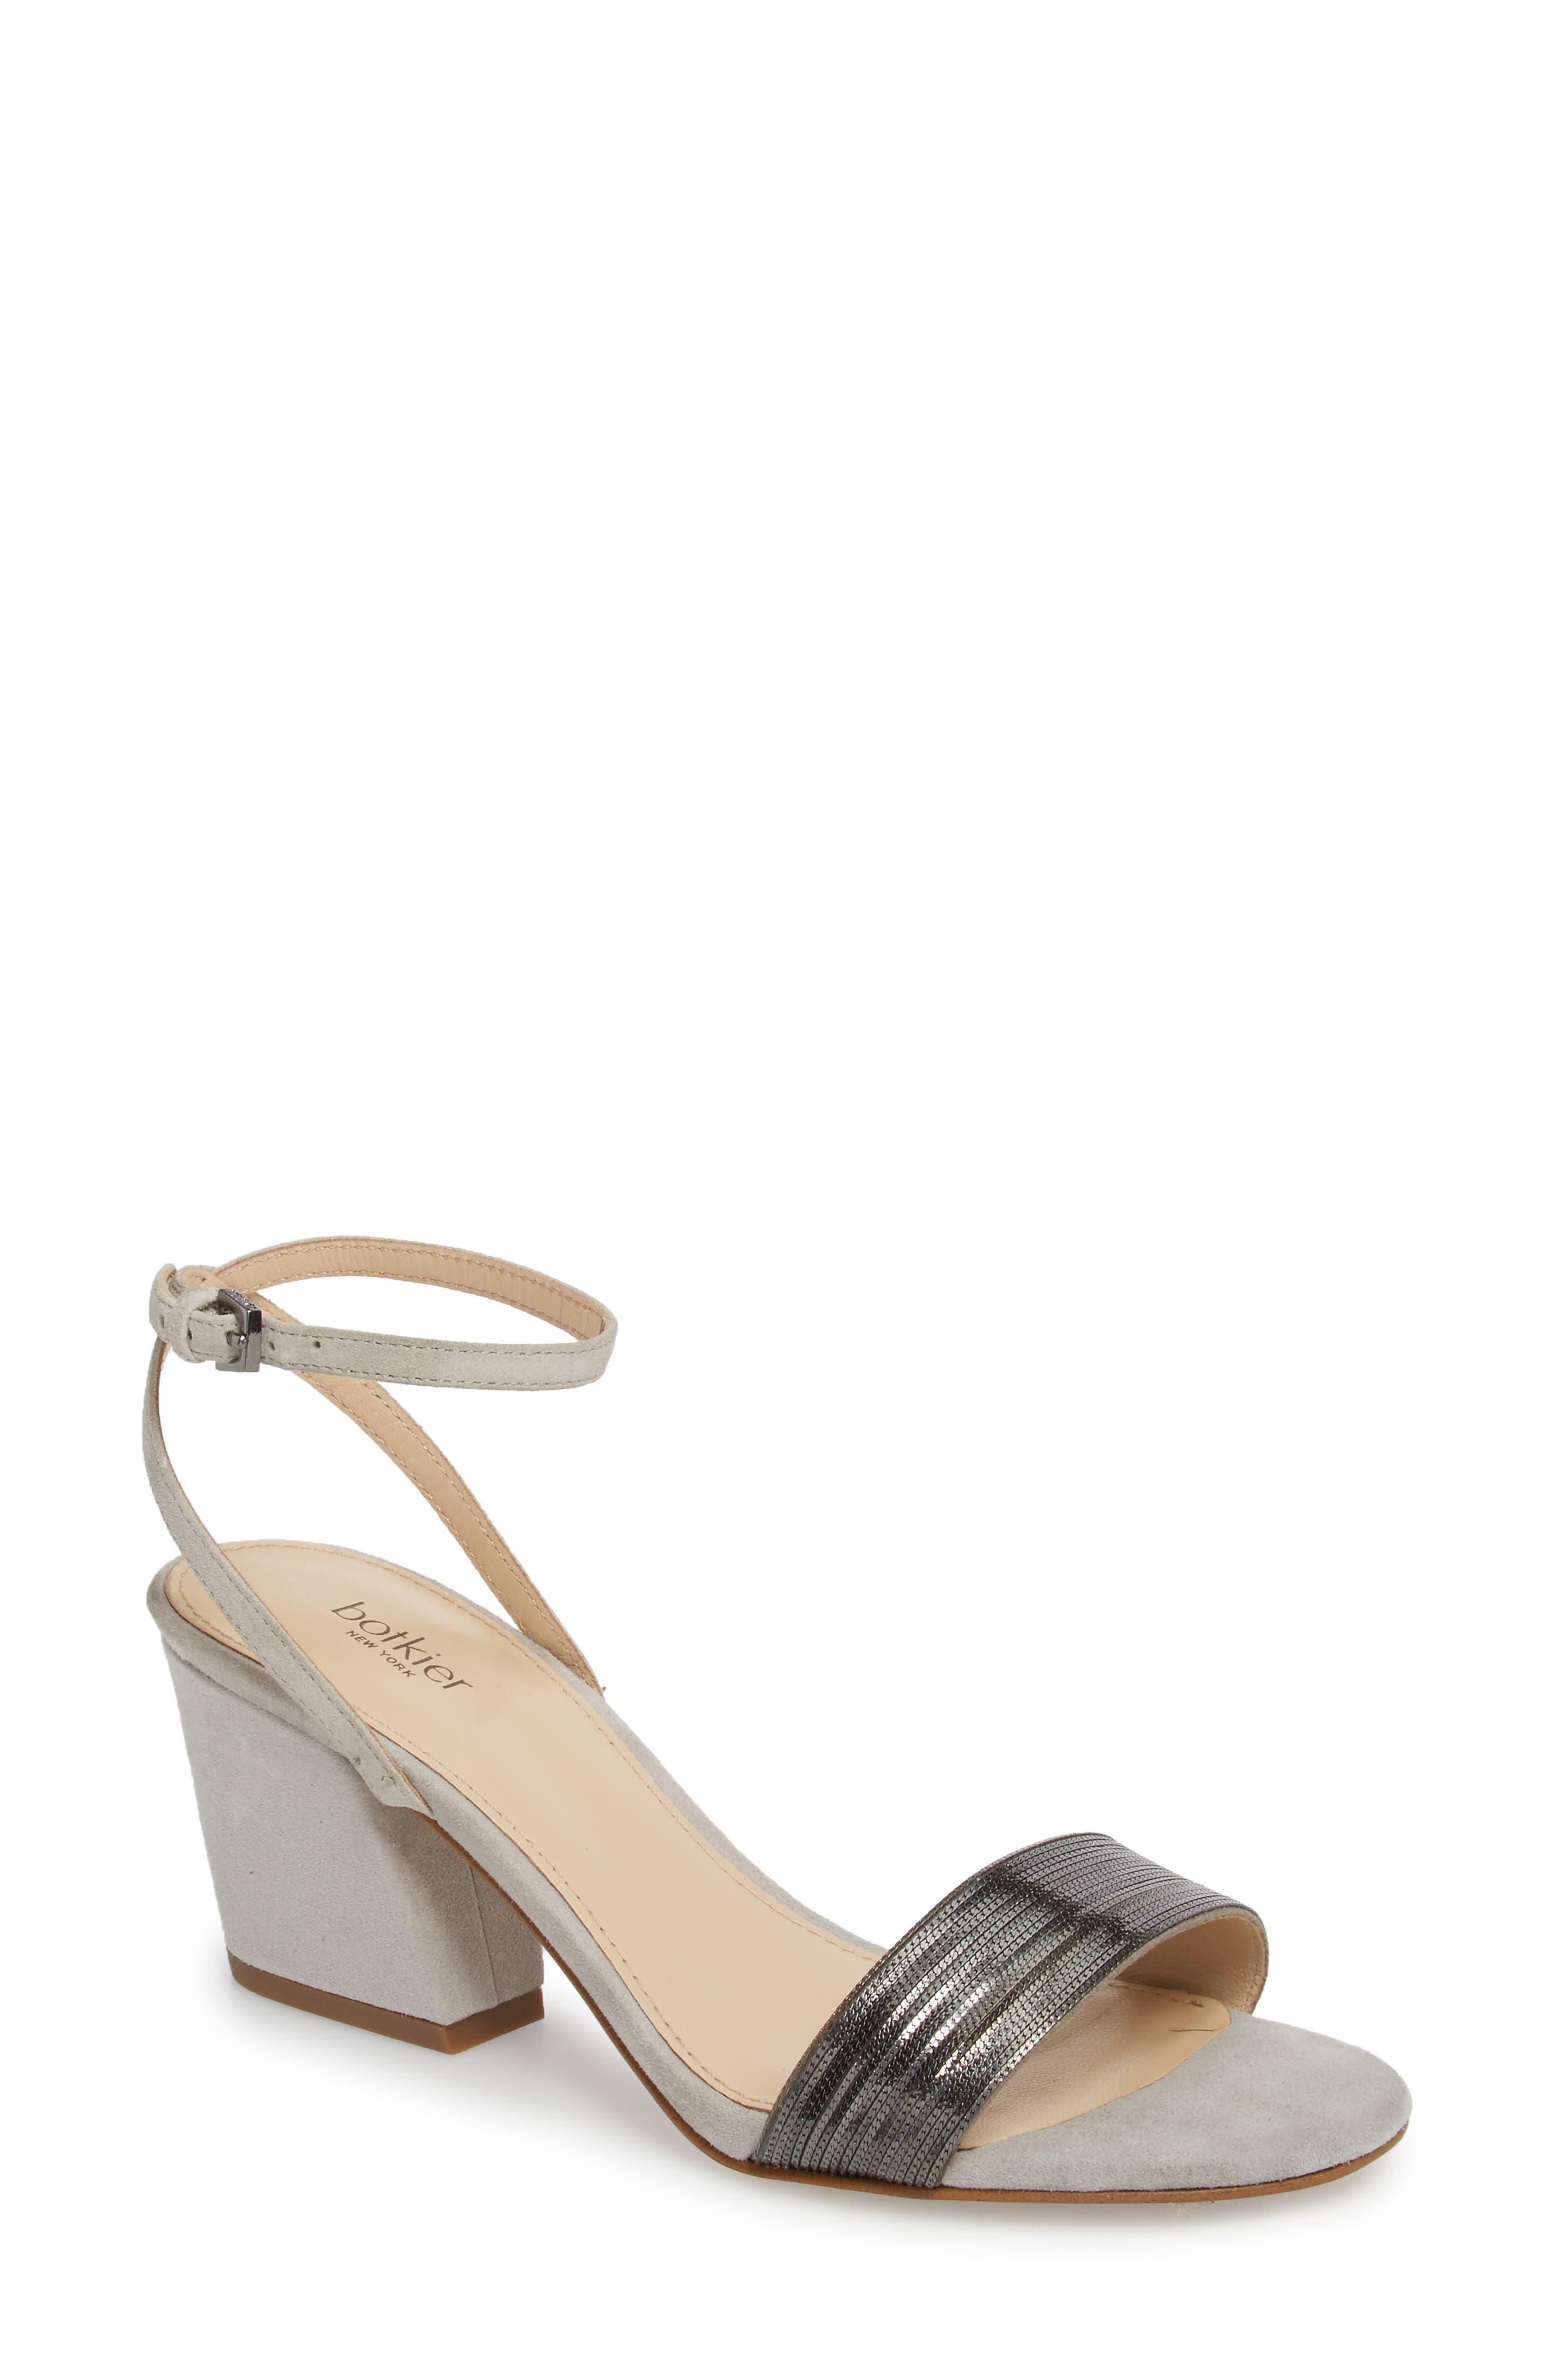 Persi Chain Wraparound Sandal,                             Main thumbnail 1, color,                             040